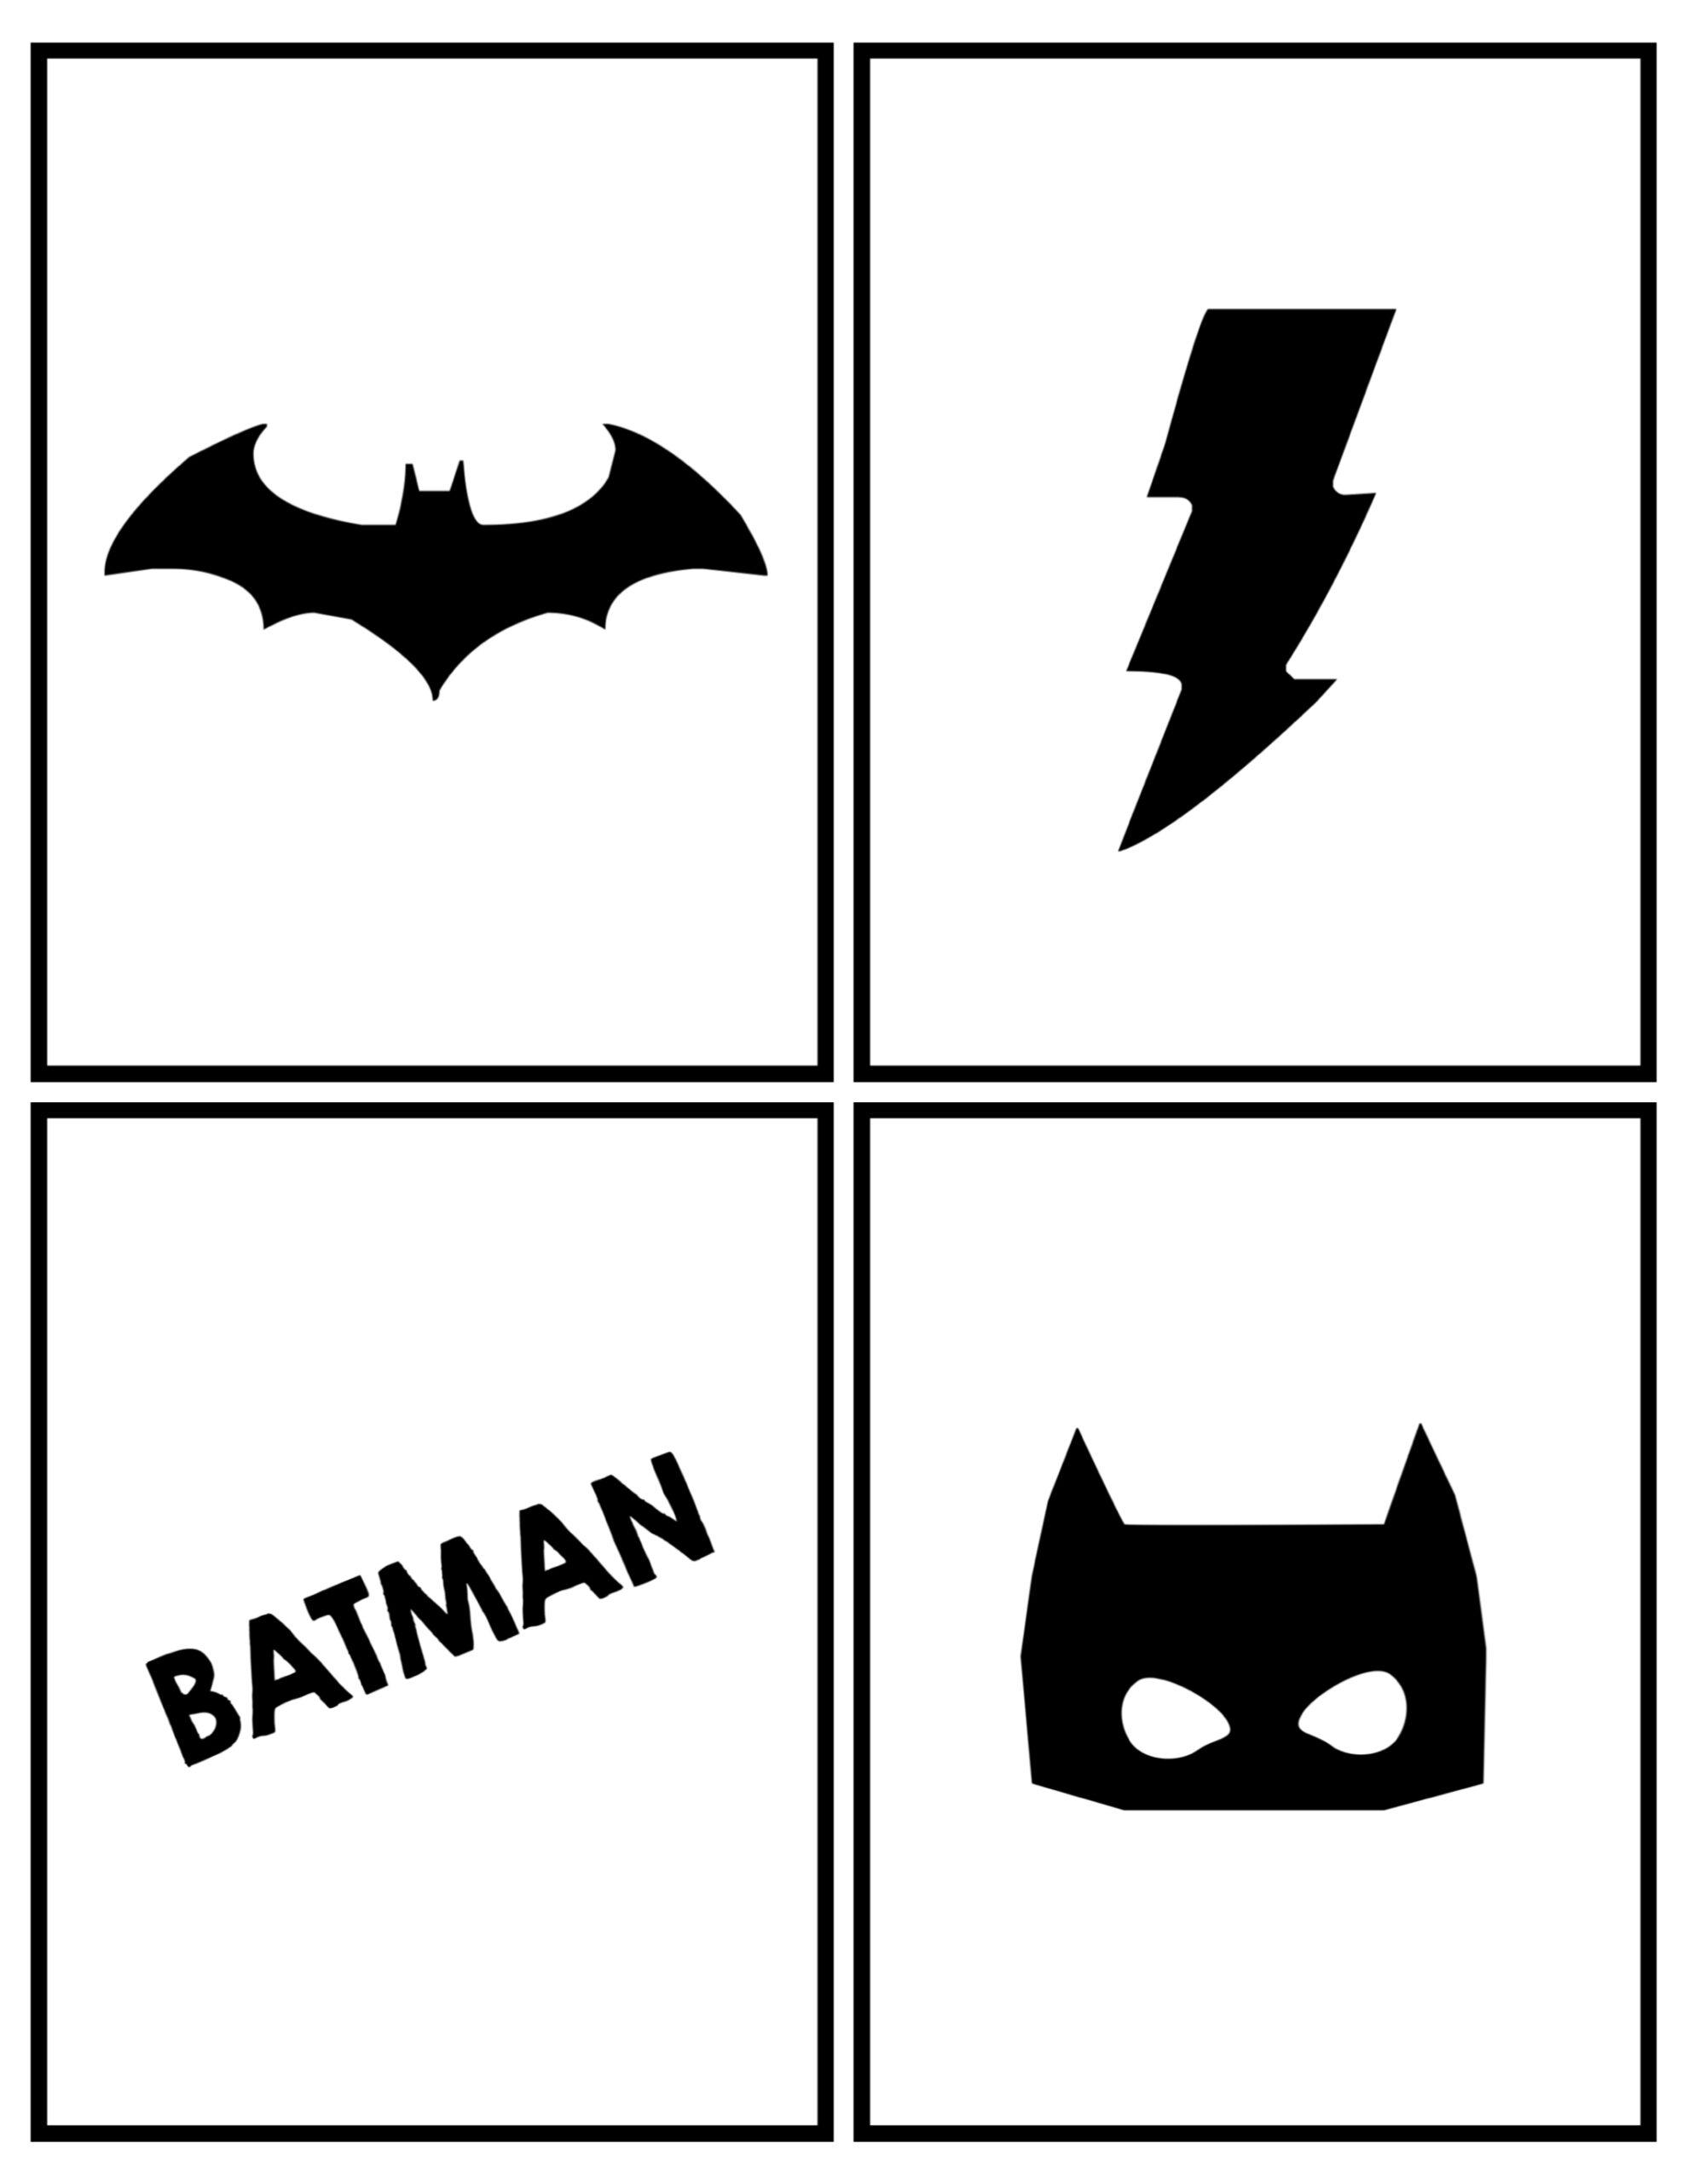 Batman Party Banner Free Printable - Paper Trail Design